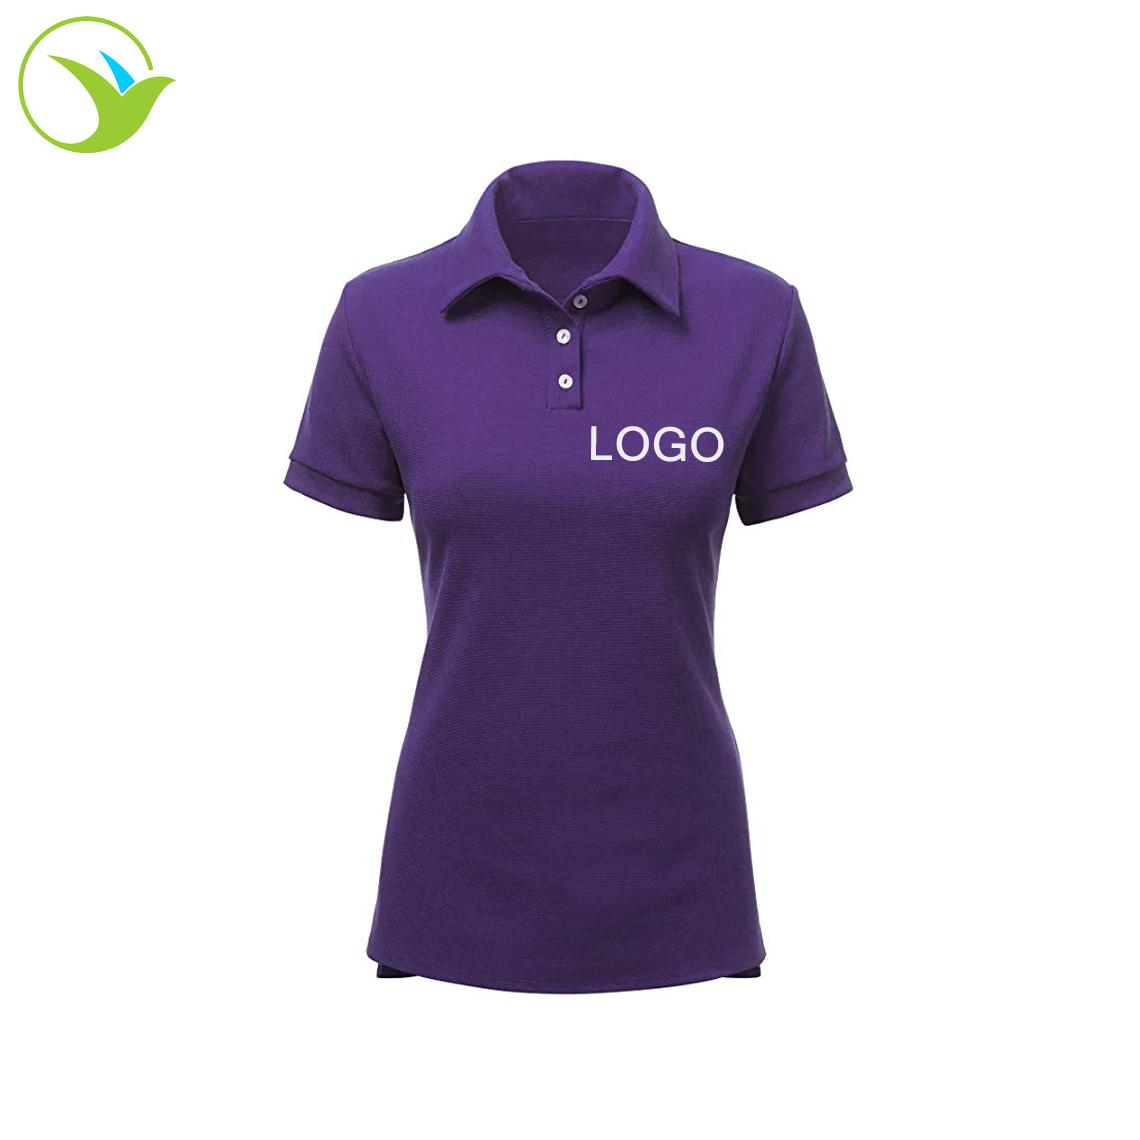 cotton shirt apply pol - HD1140×1140